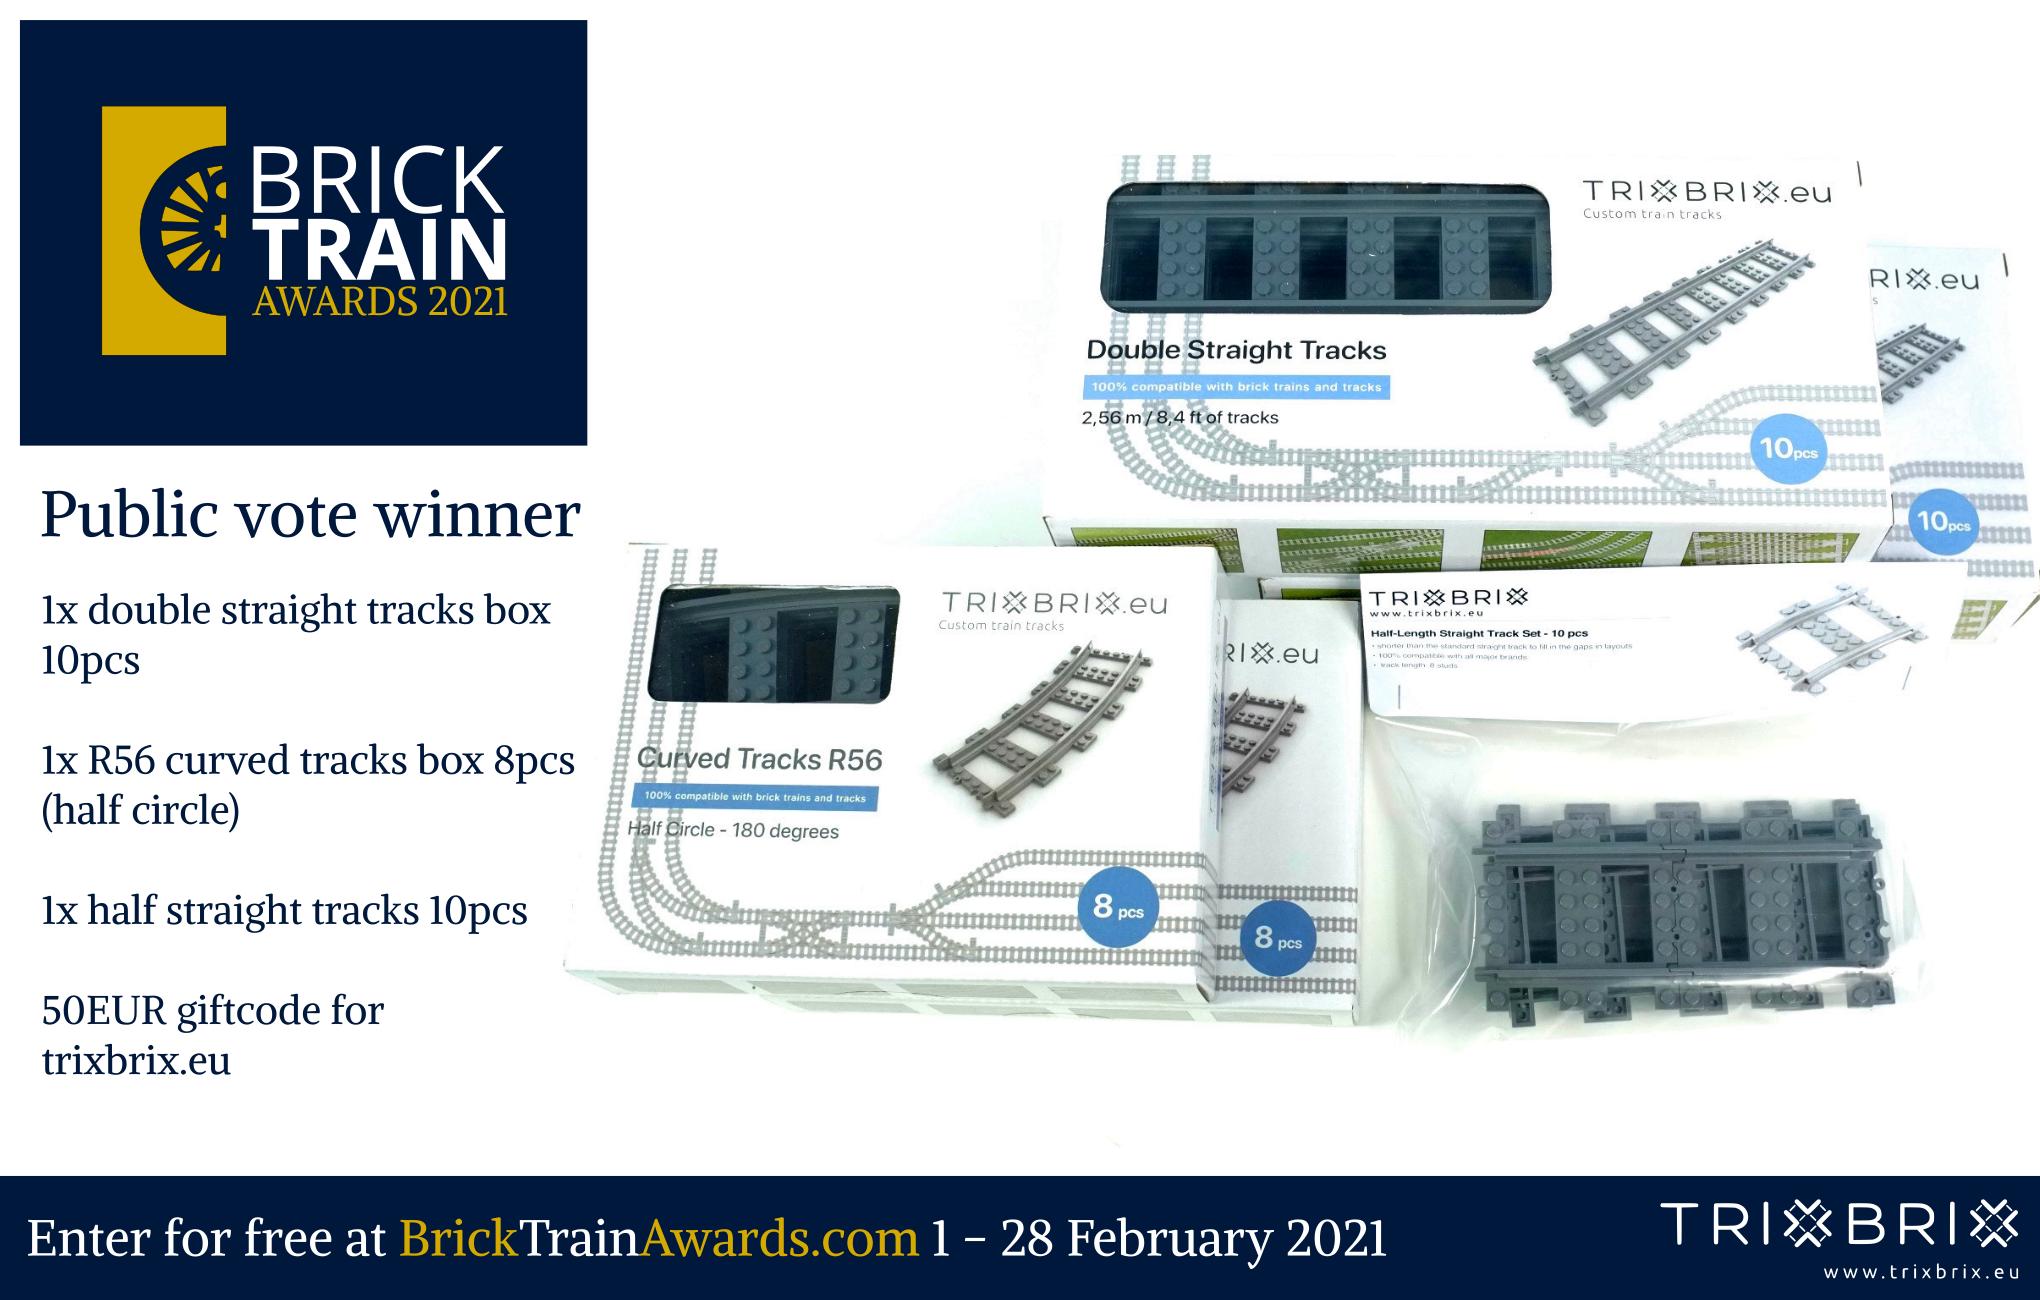 Brick Train Awards public vote - prizes 2021